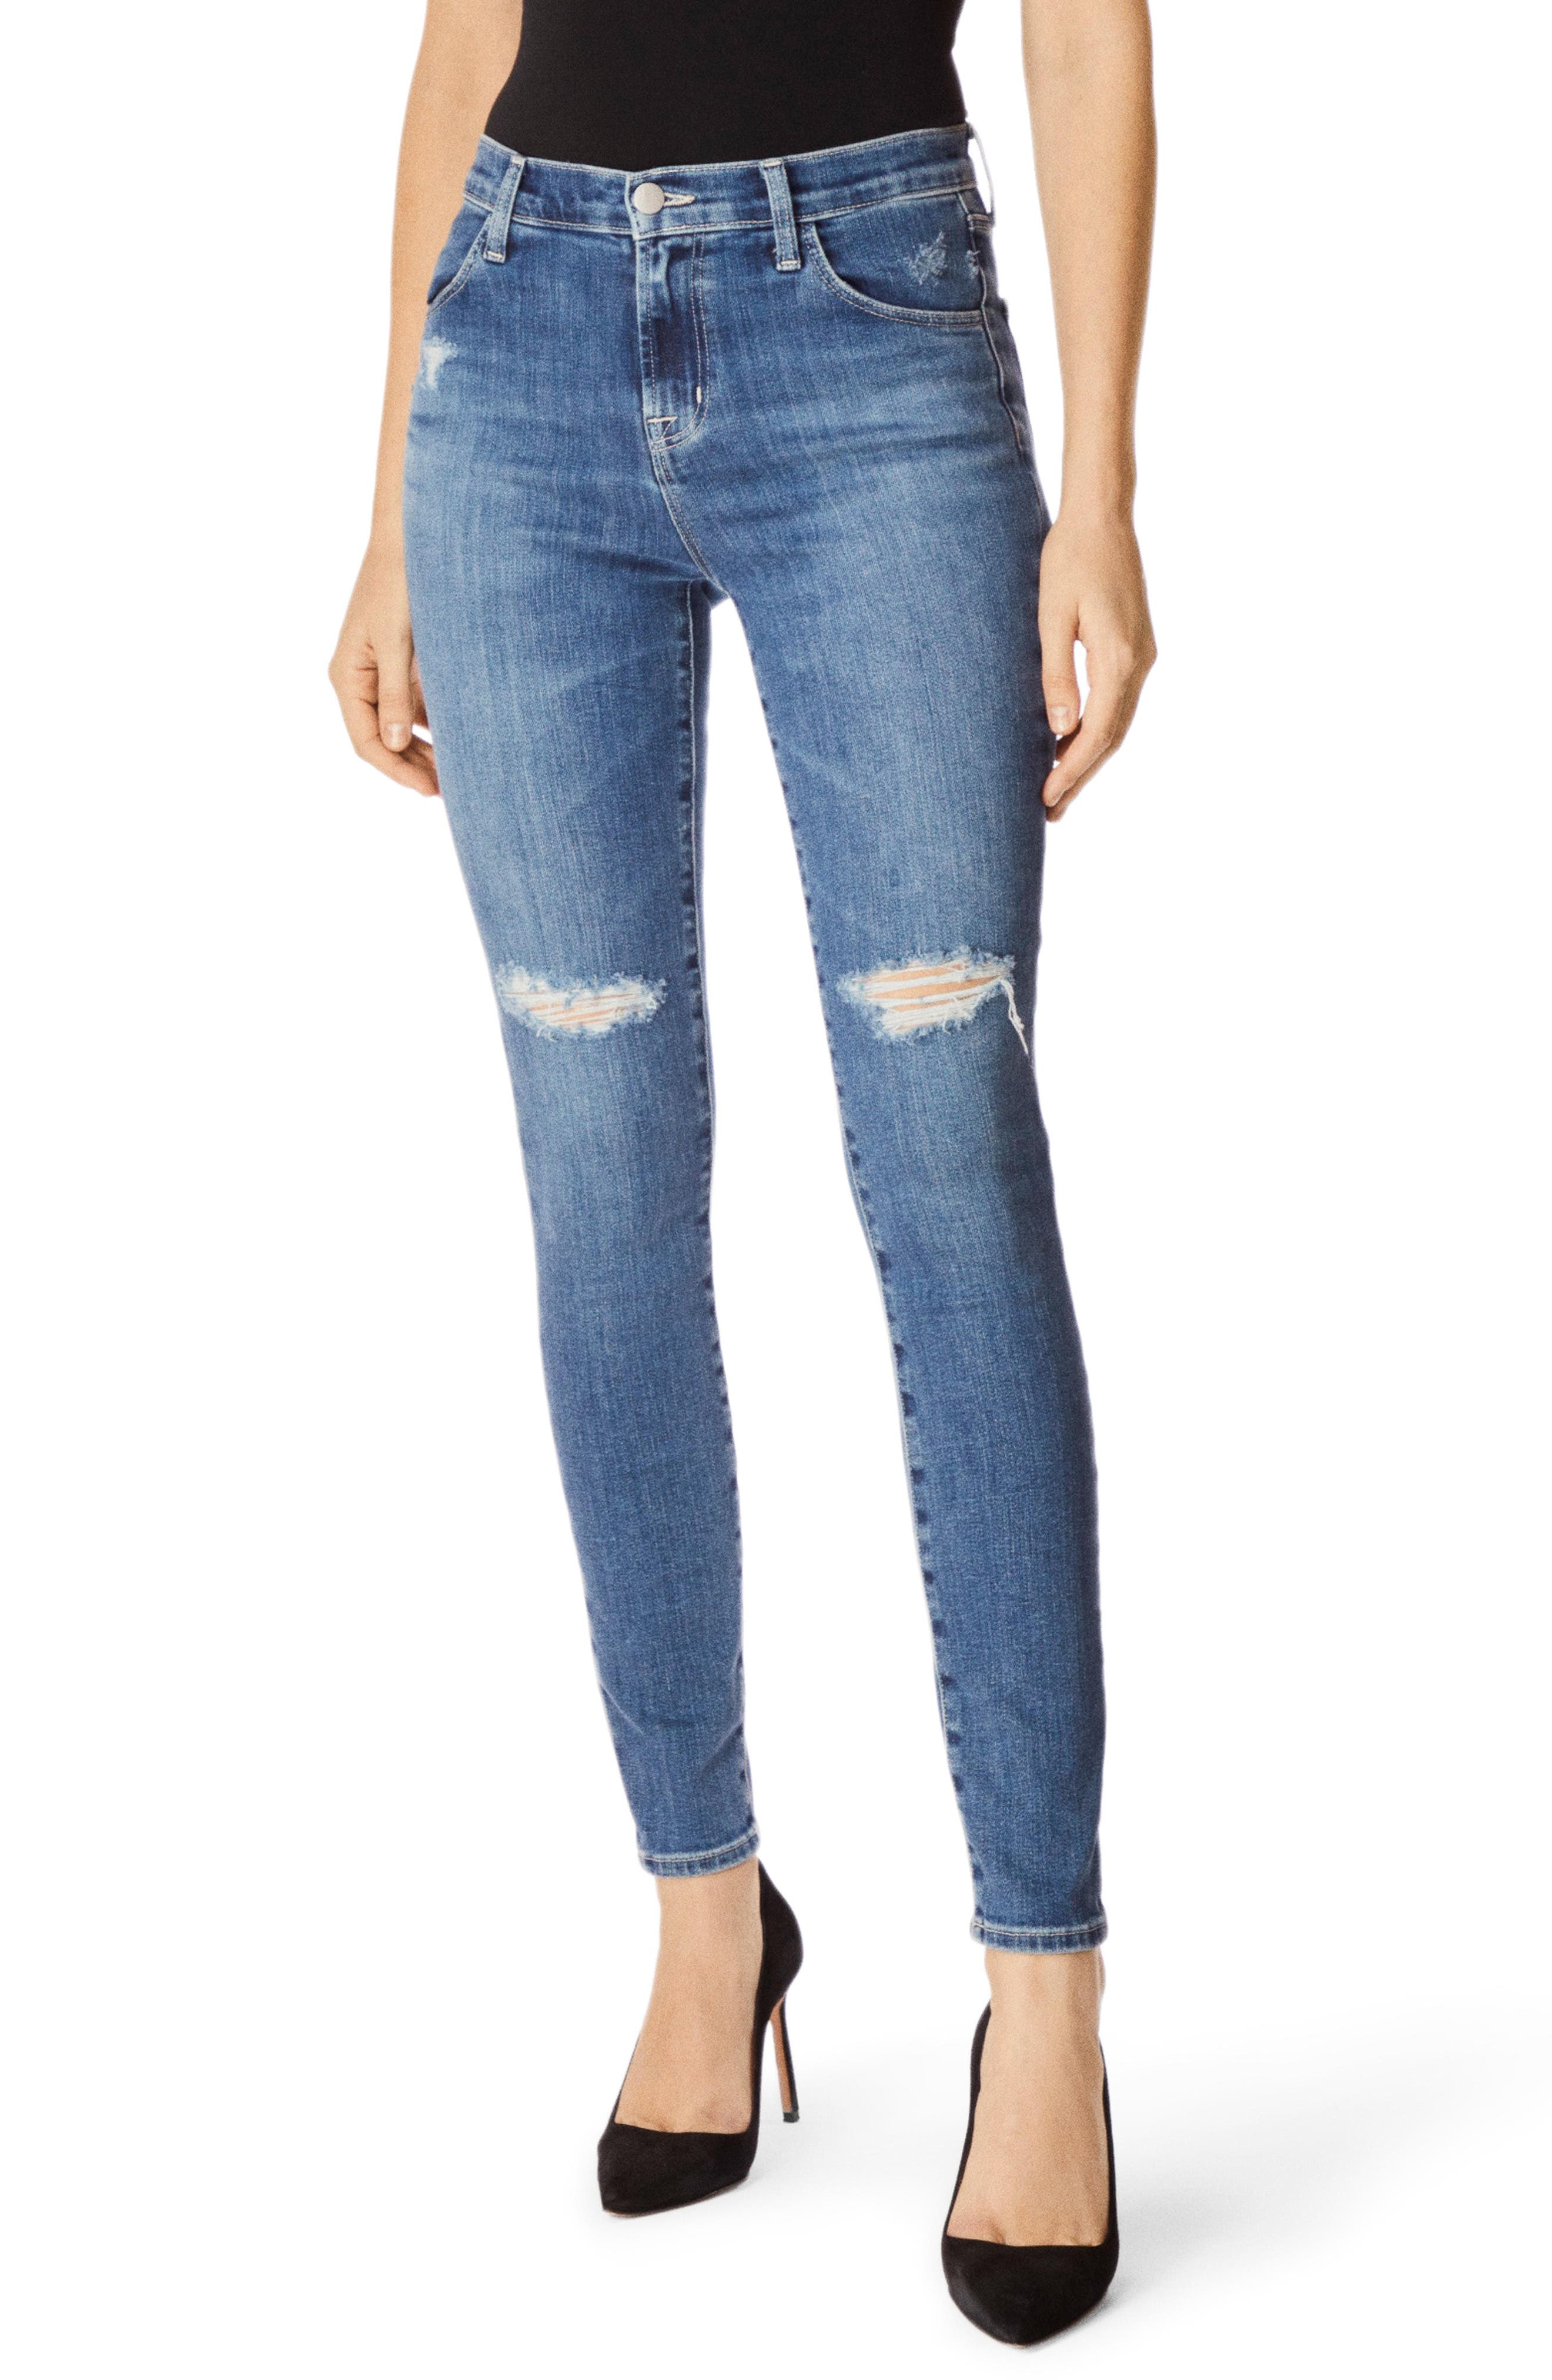 J Brand Jeans MARIA HIGH WAIST SKINNY JEANS